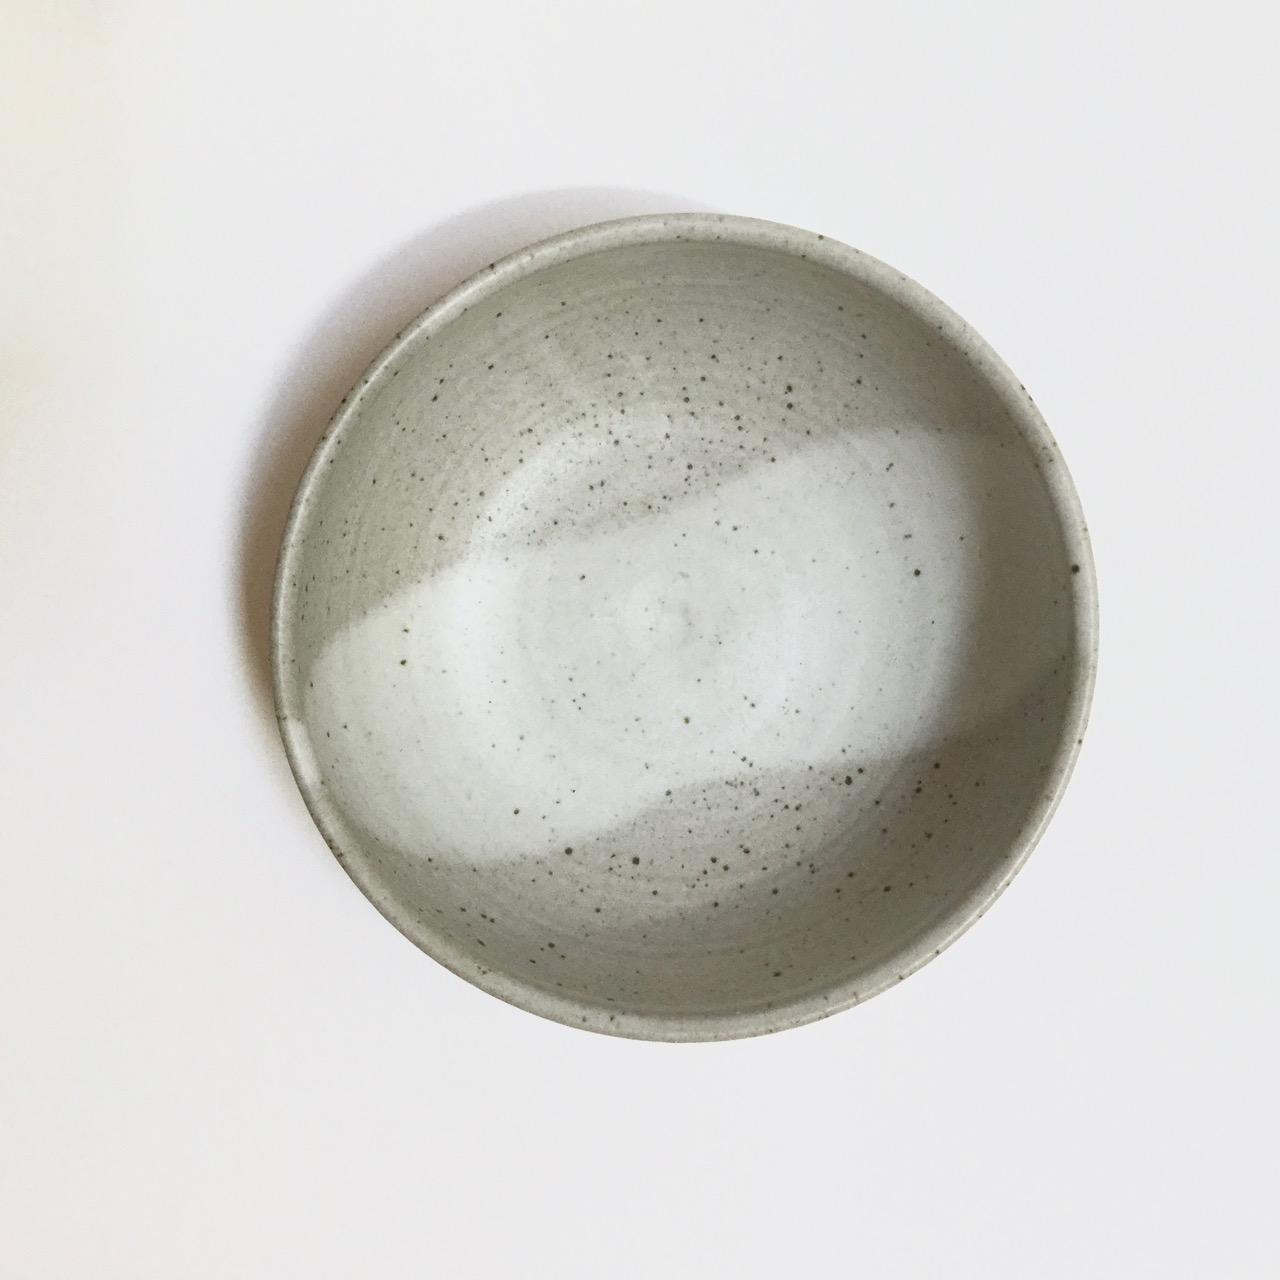 1053 Small serving bowl top.jpg